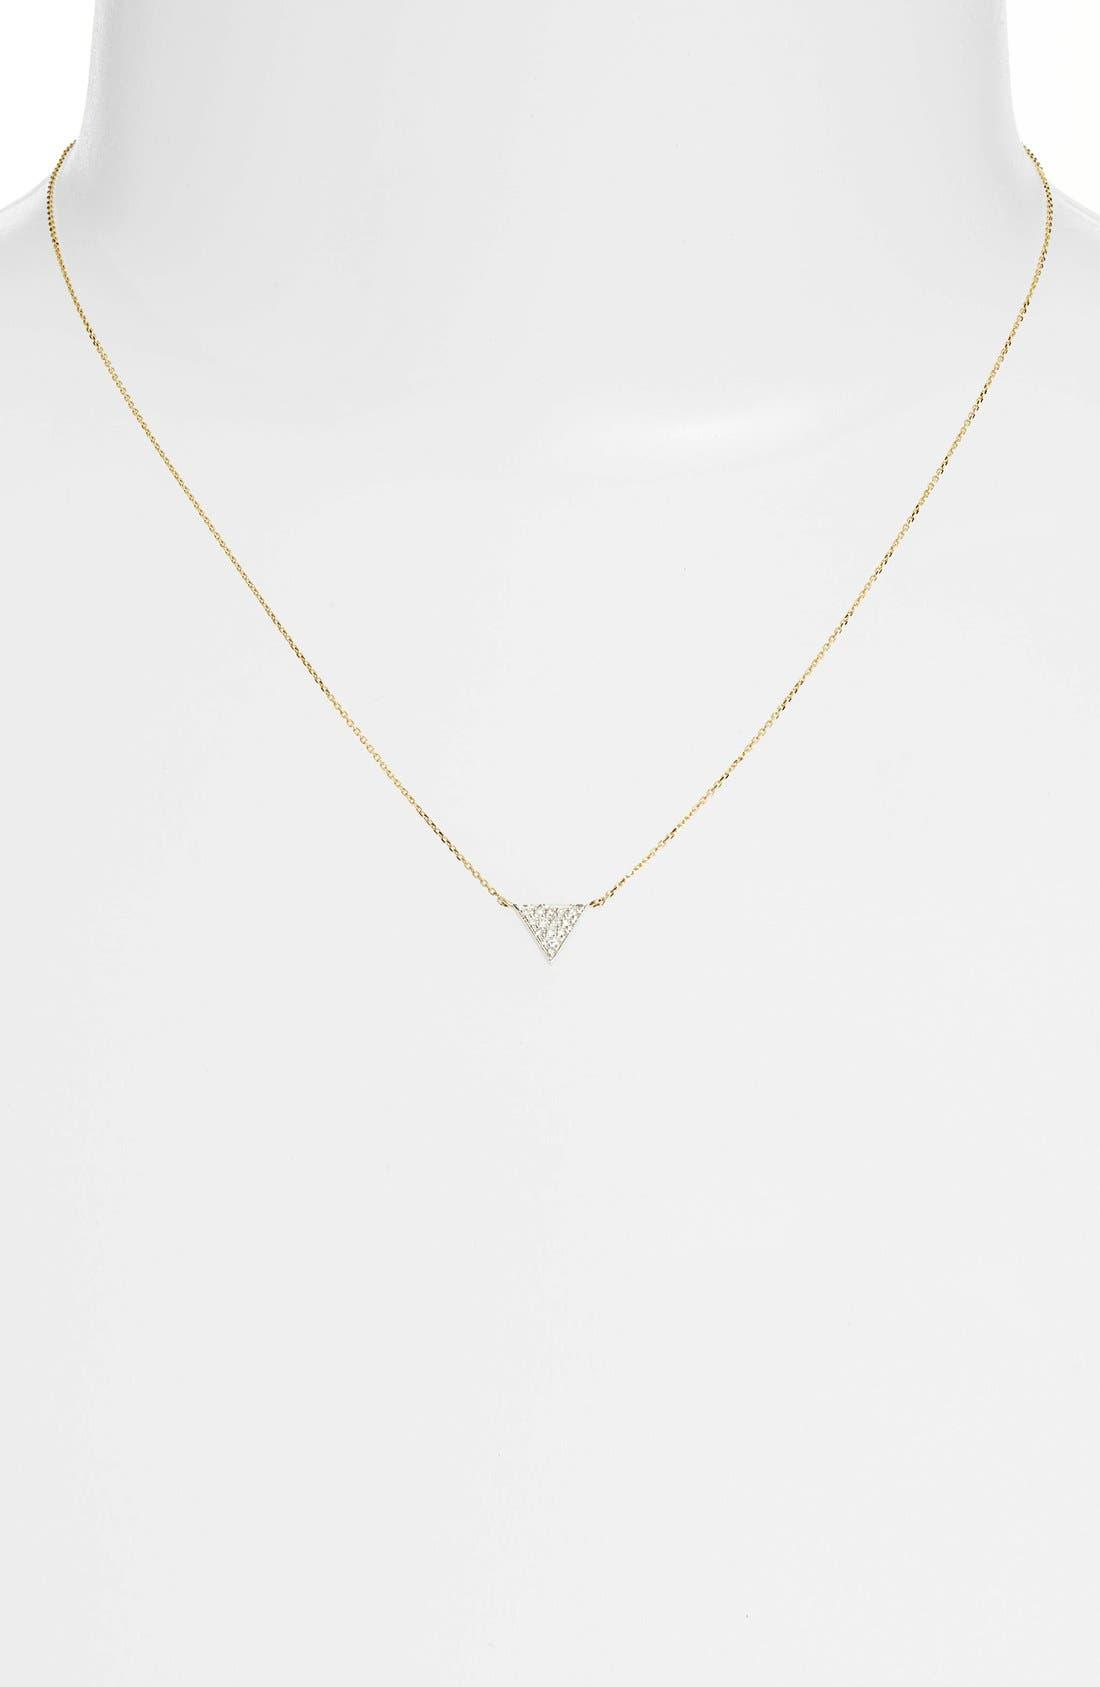 'Emily Sarah' Diamond Triangle Pendant Necklace,                             Alternate thumbnail 6, color,                             YELLOW GOLD